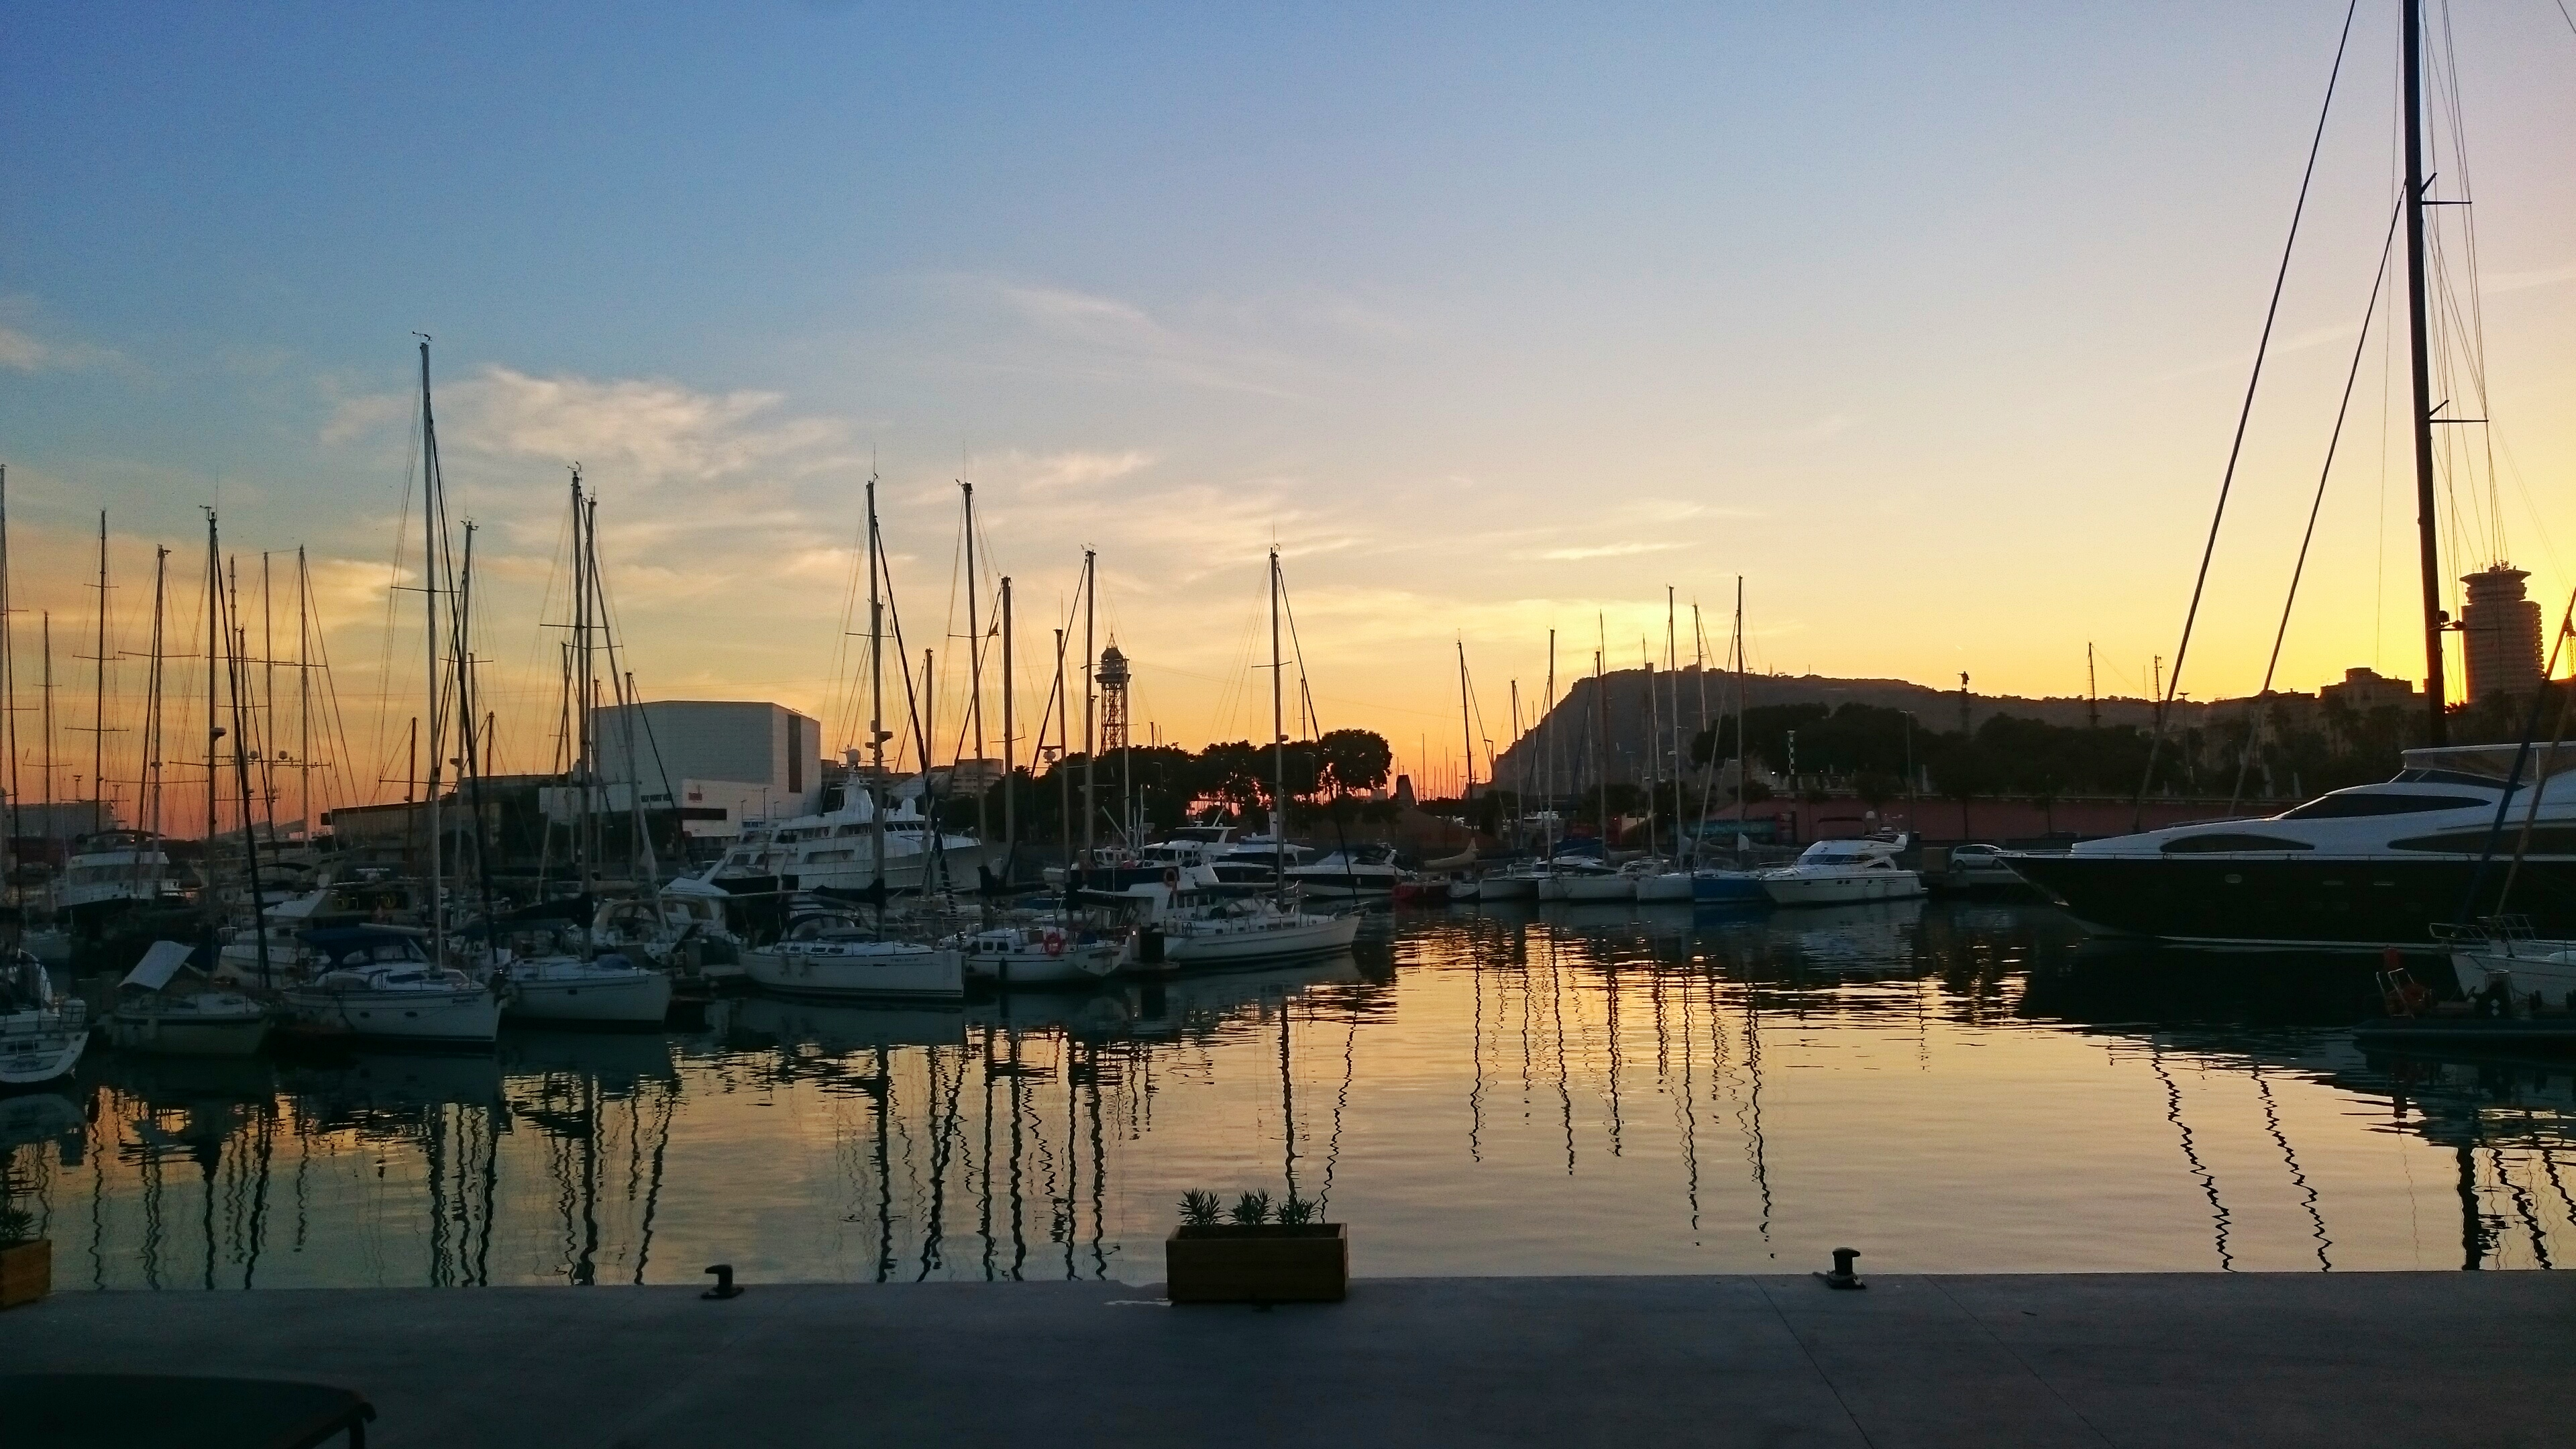 solnedgång barcelona båtar